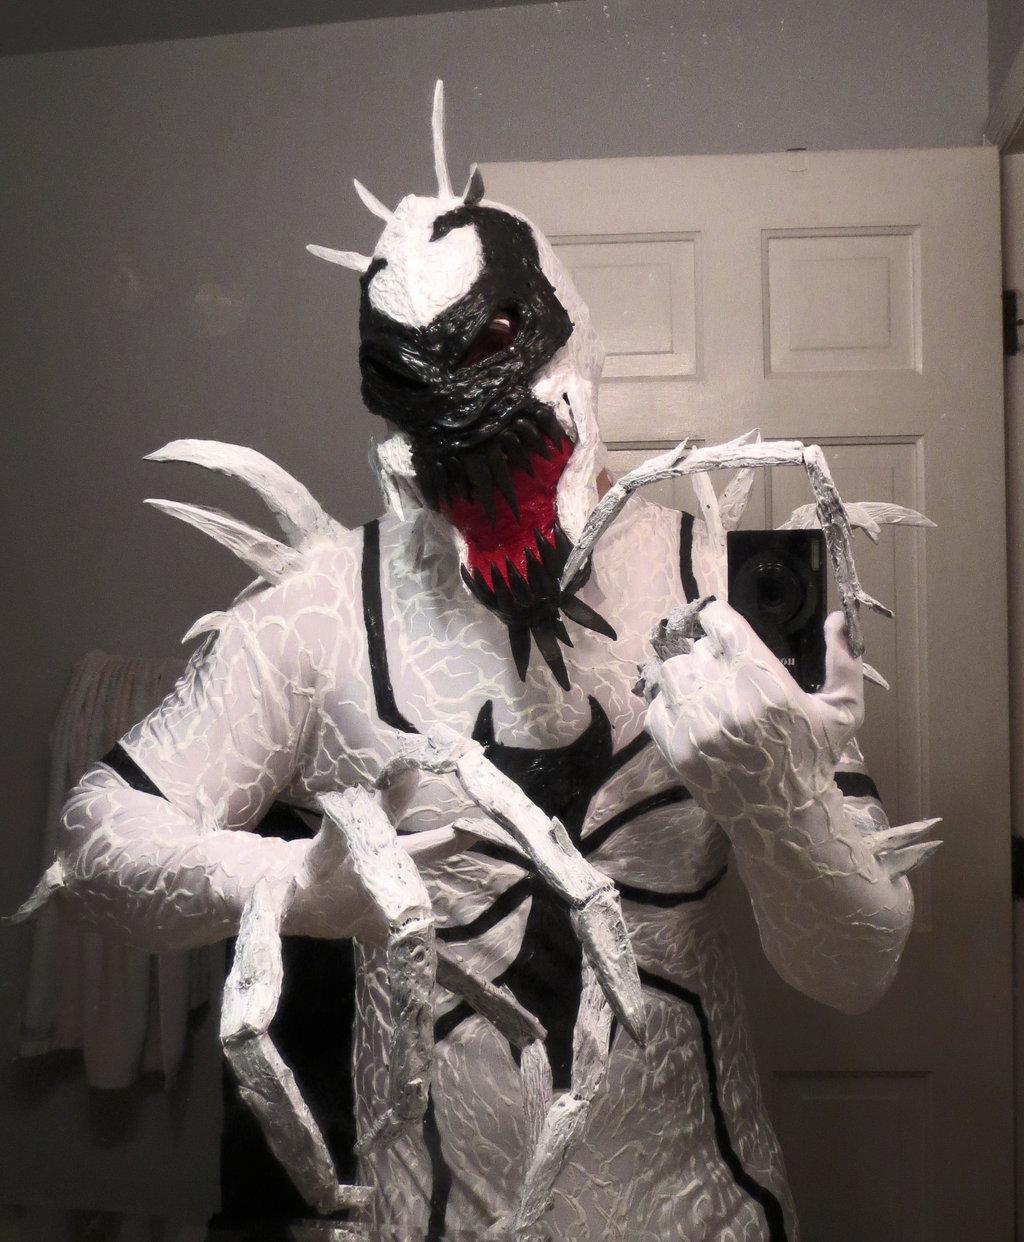 anti_venom_cosplay_by_symbiote_x-d797ppu